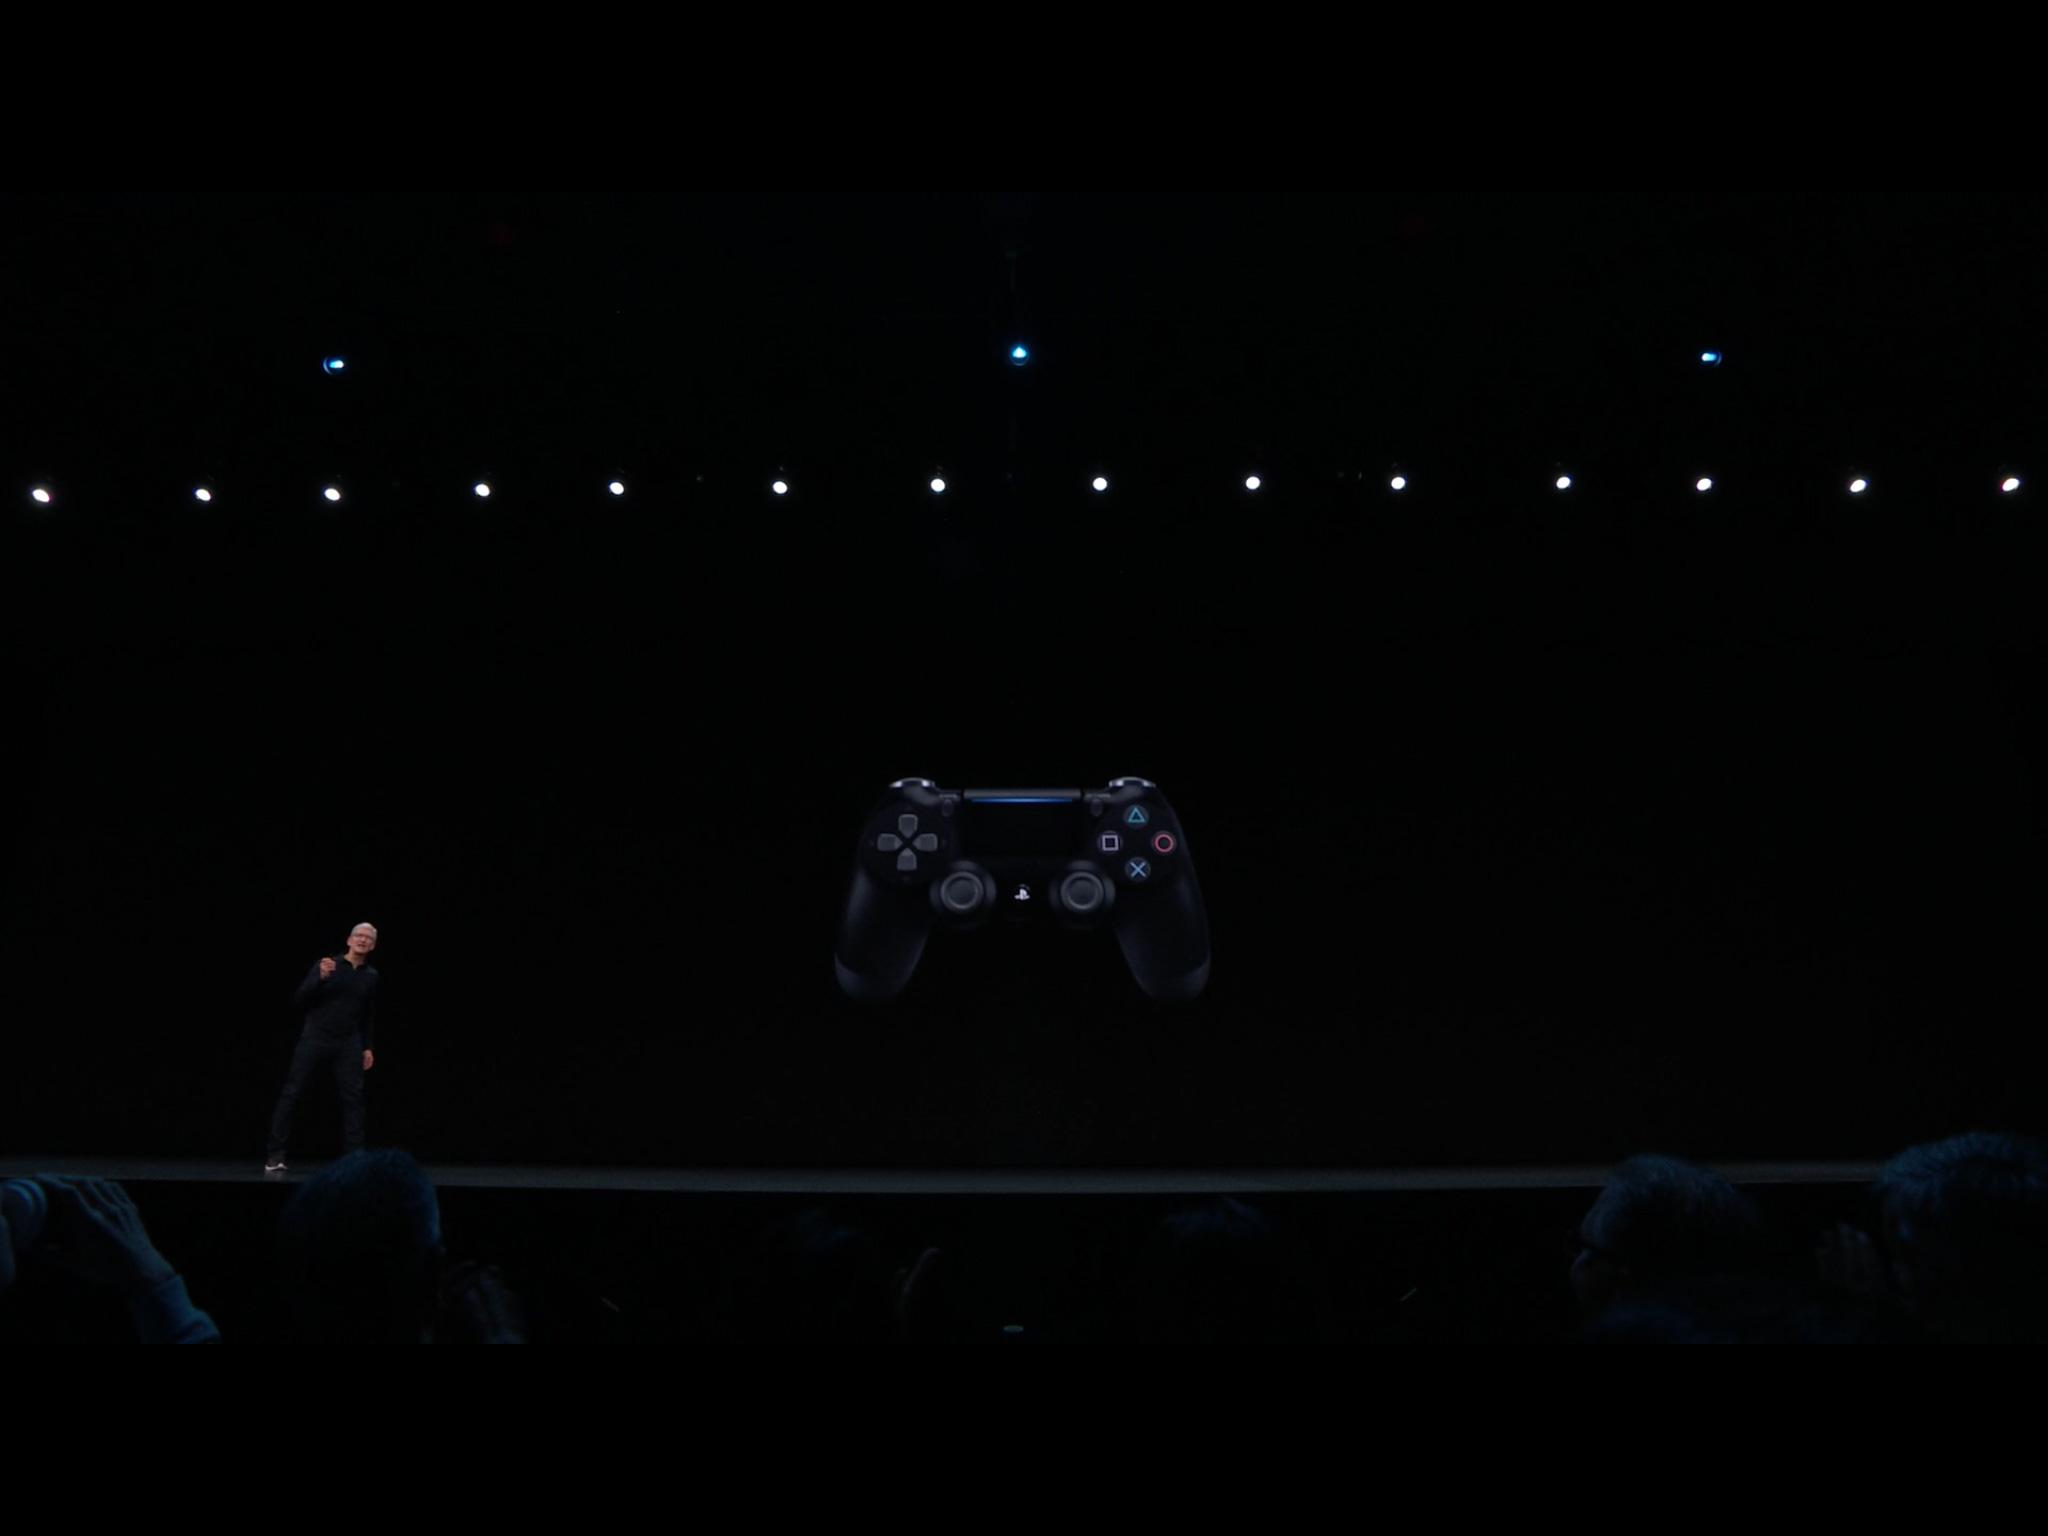 PS4 Apple TV